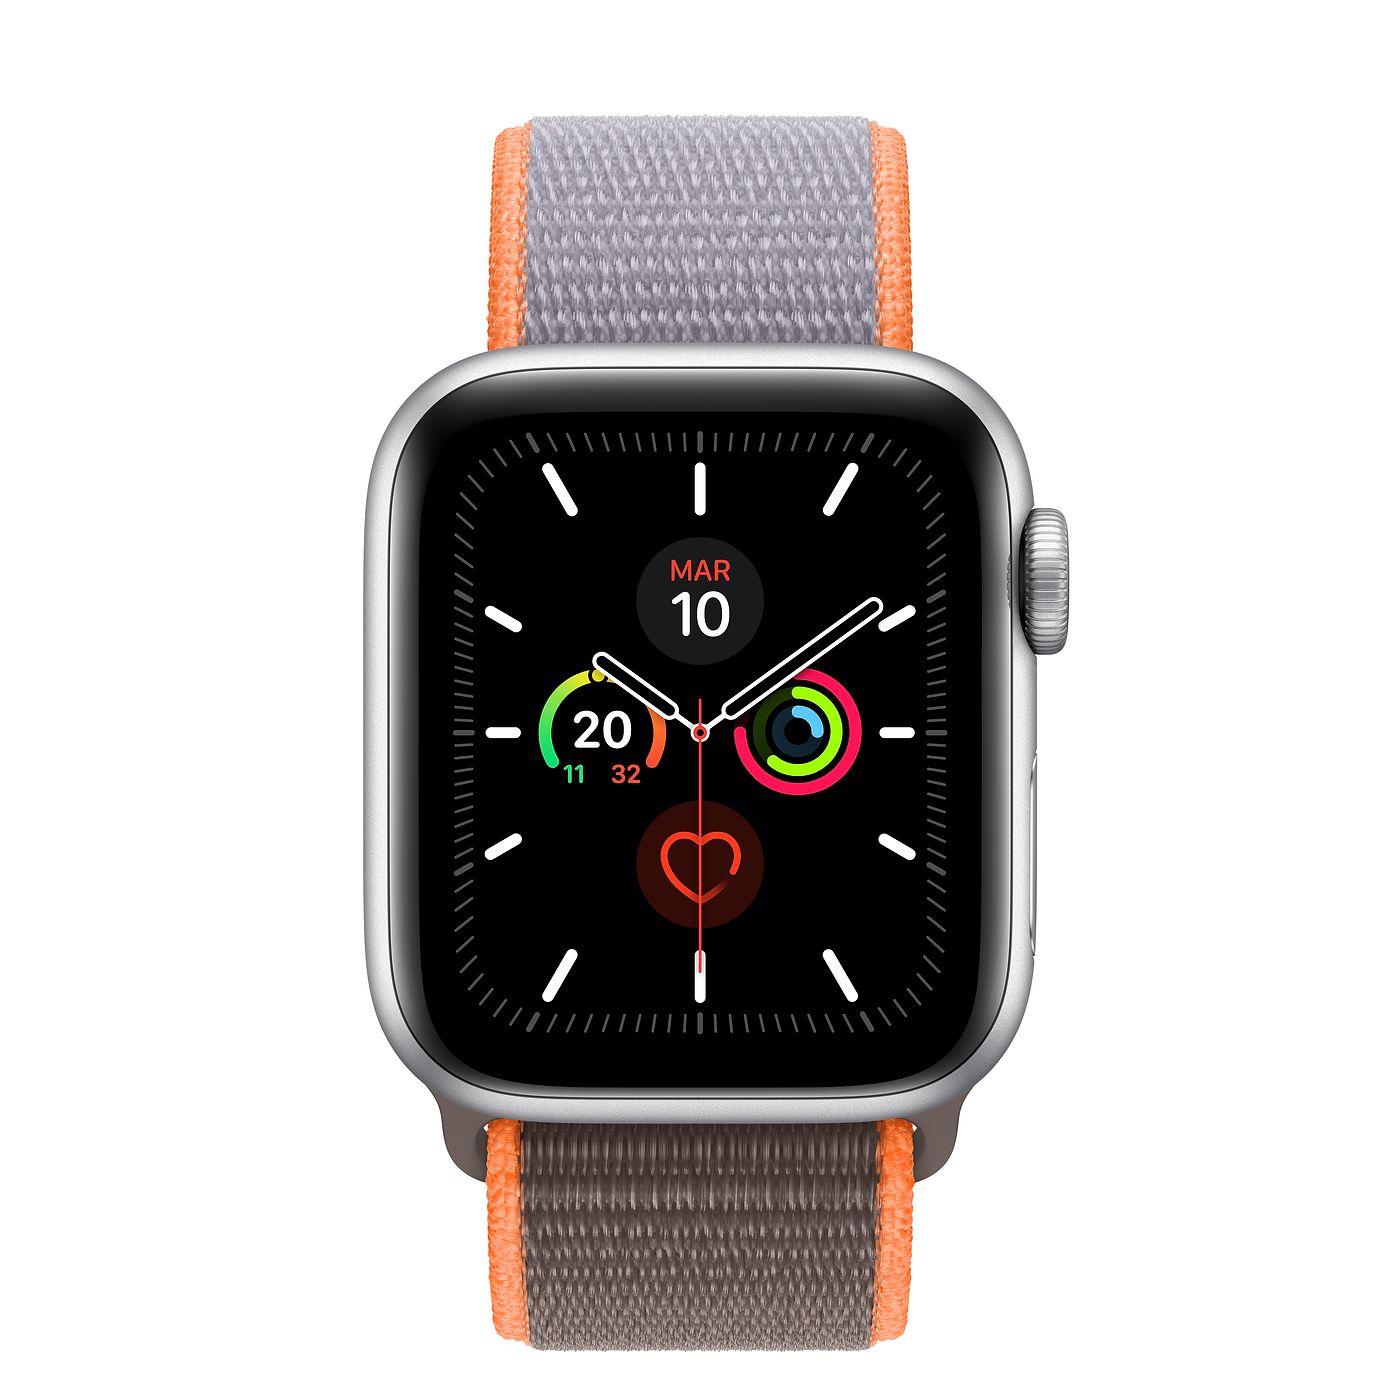 MXMM2_VW_PF+watch-40-alum-silver-nc-5s_VW_PF_WF_CO_GEO_ES